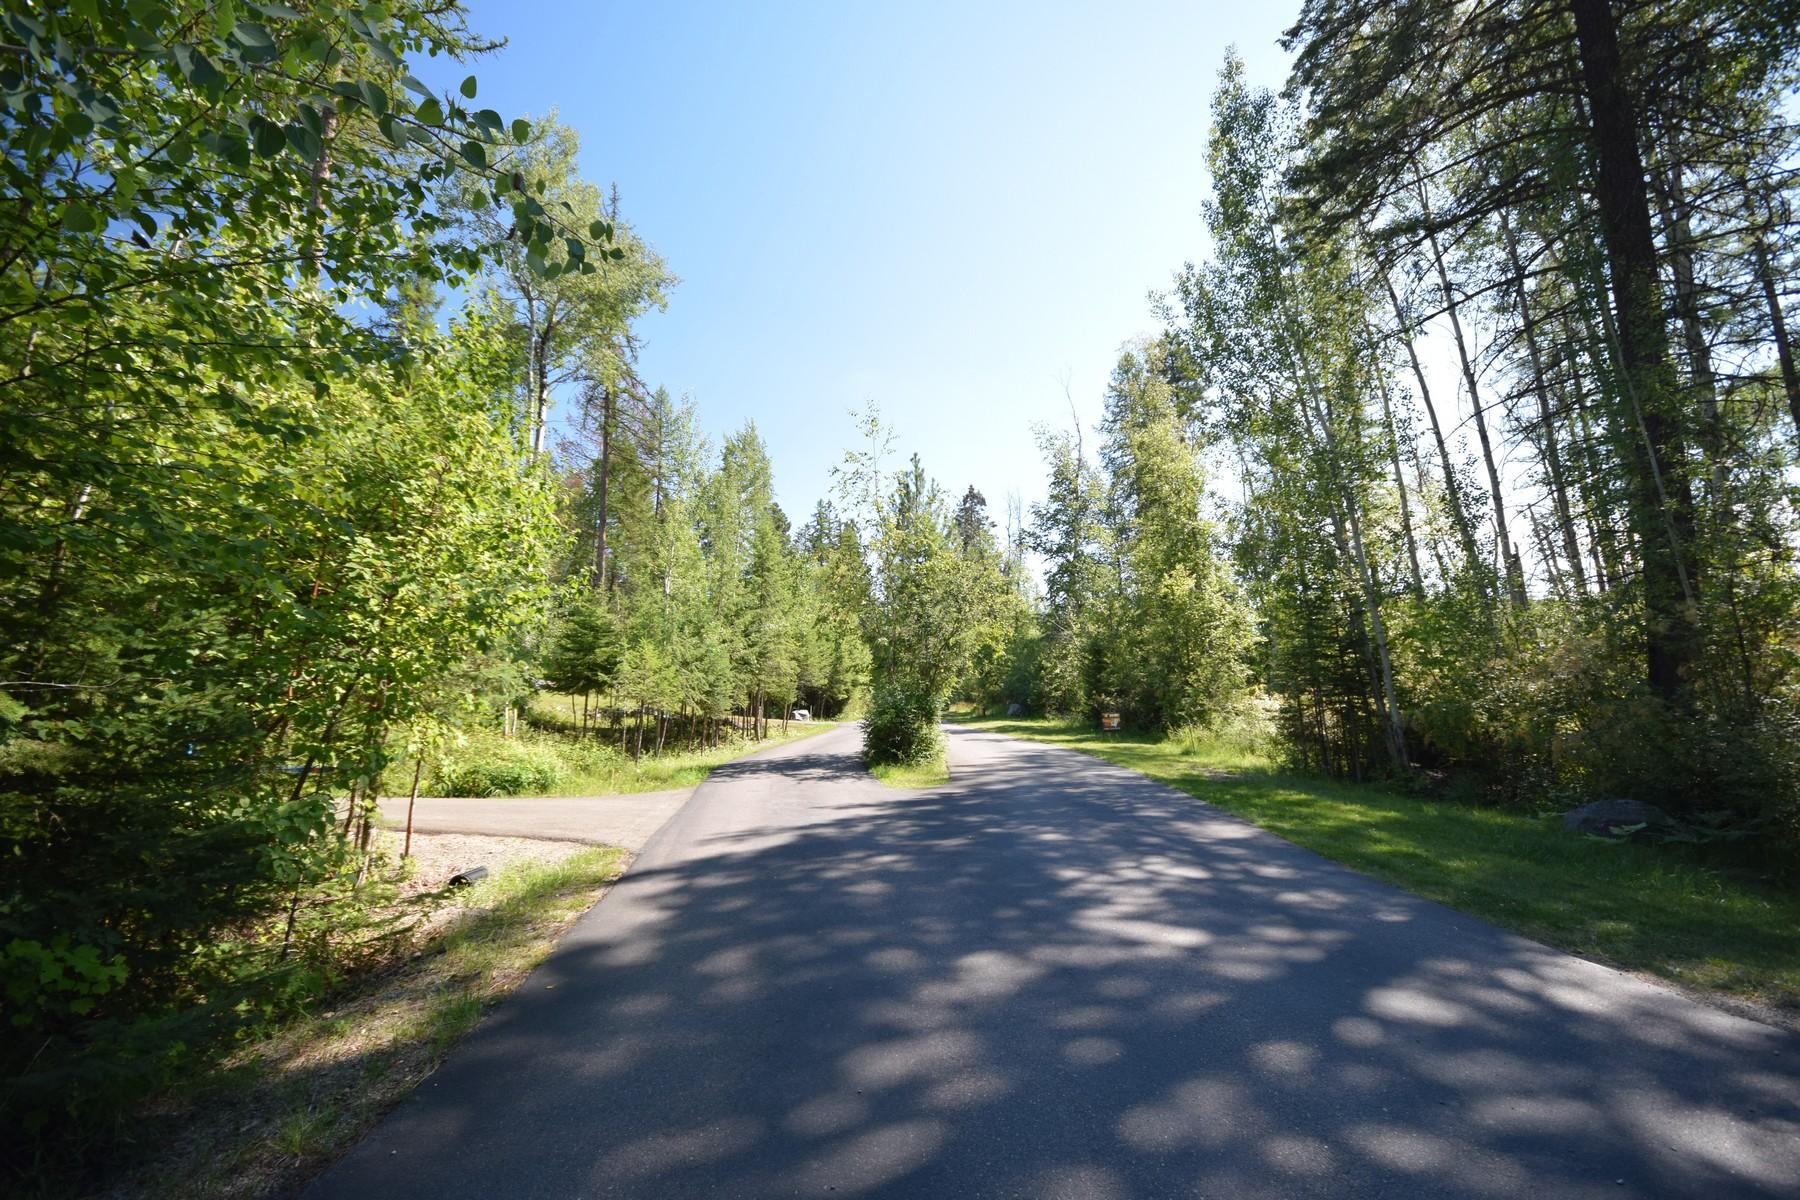 Additional photo for property listing at 682 Latigo Ln , Bigfork, MT 59911 682  Latigo Ln Bigfork, Montana 59911 United States